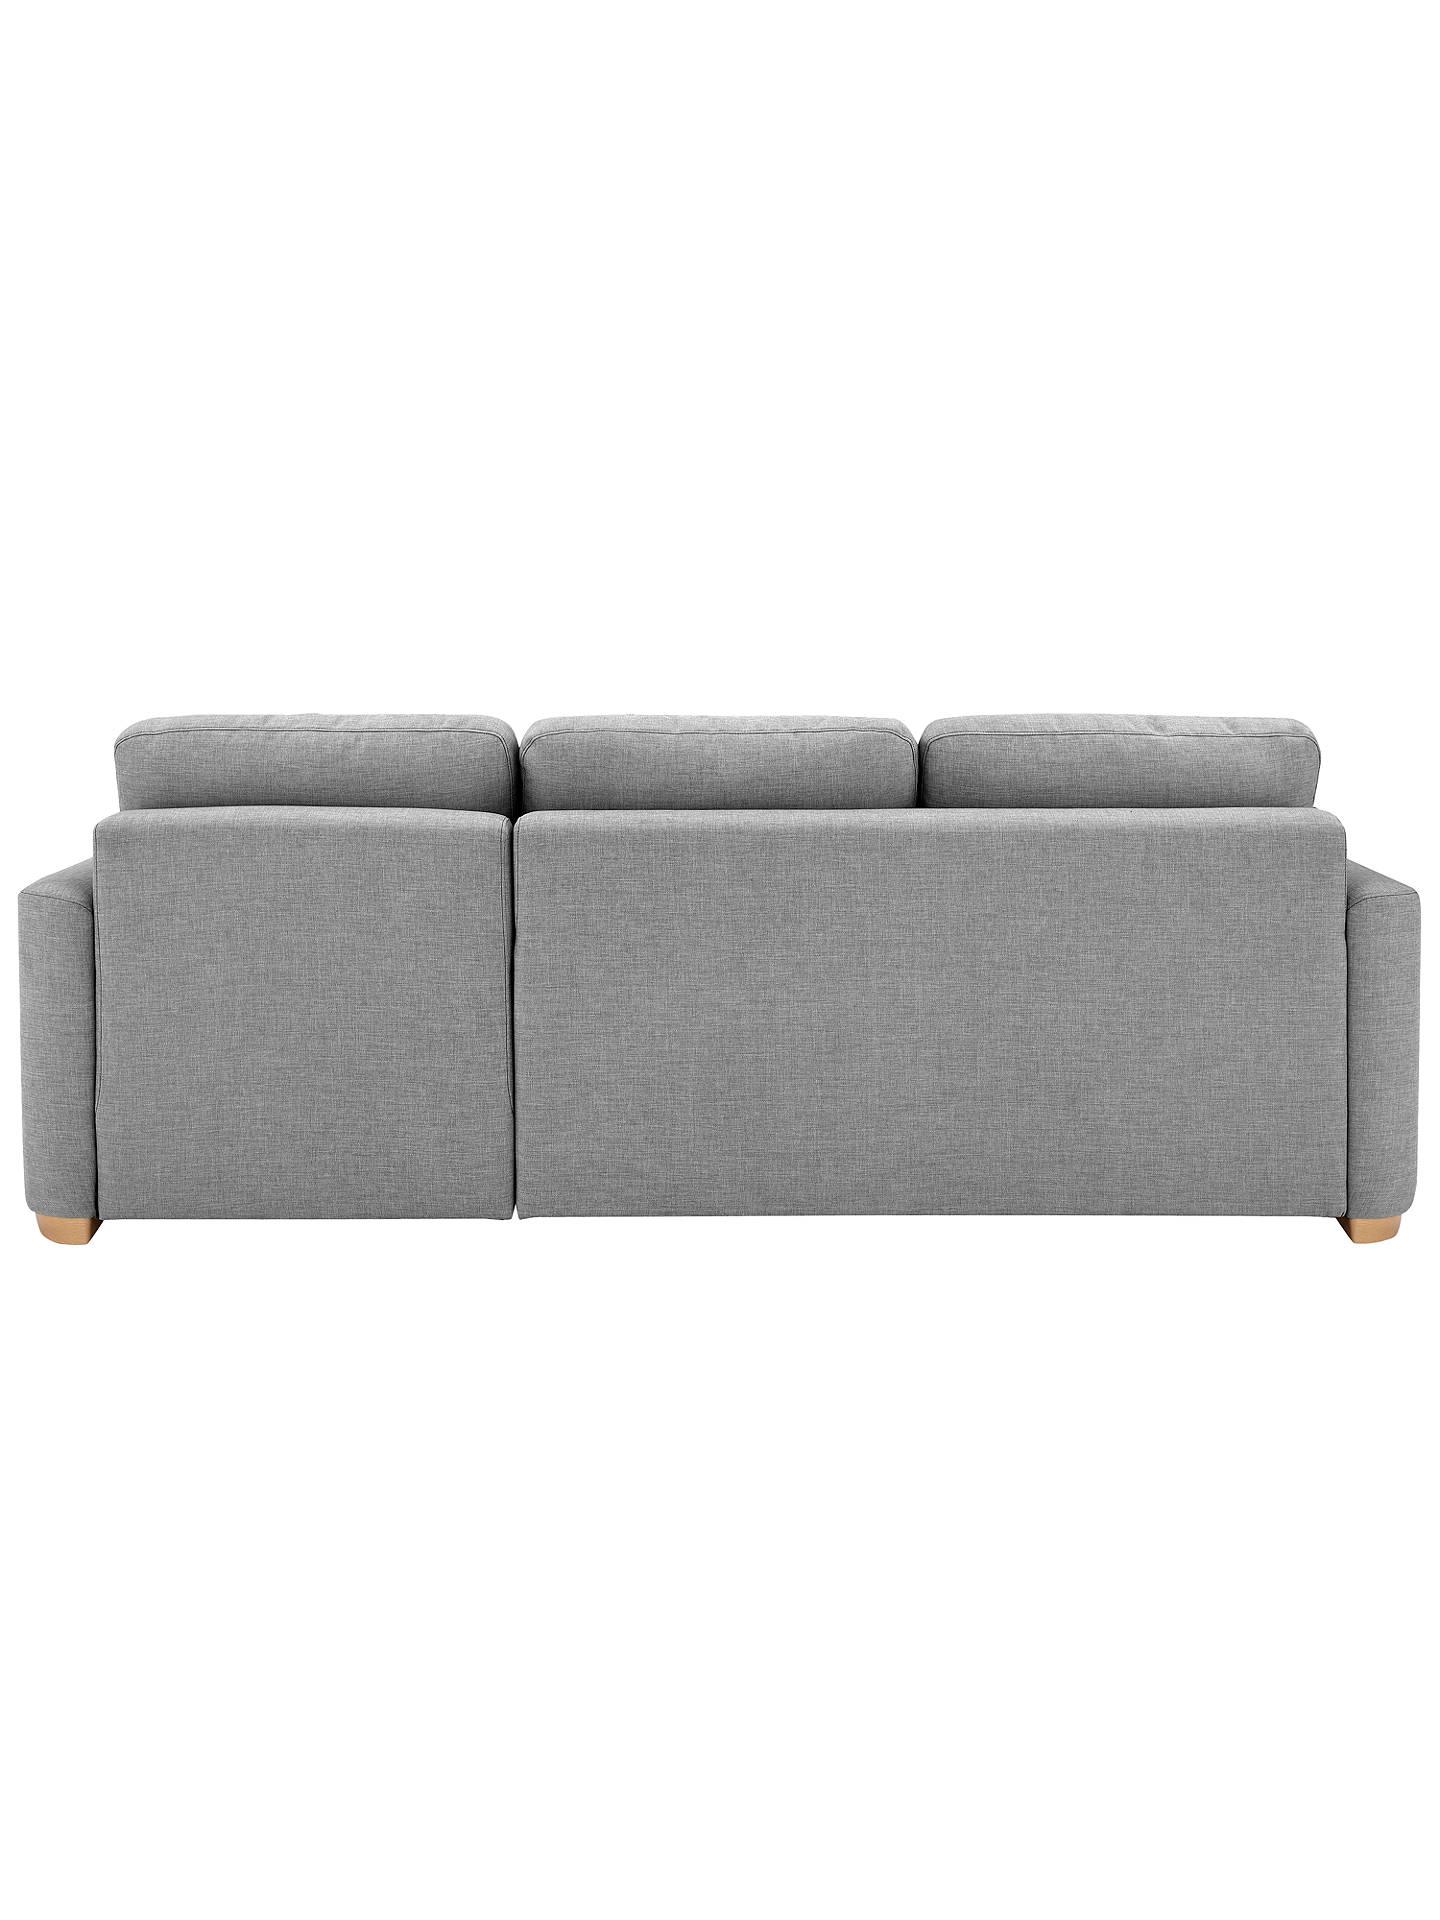 John Lewis & Partners Sacha Large Sofa Bed with Foam Mattress, Light Leg, Erin Grey